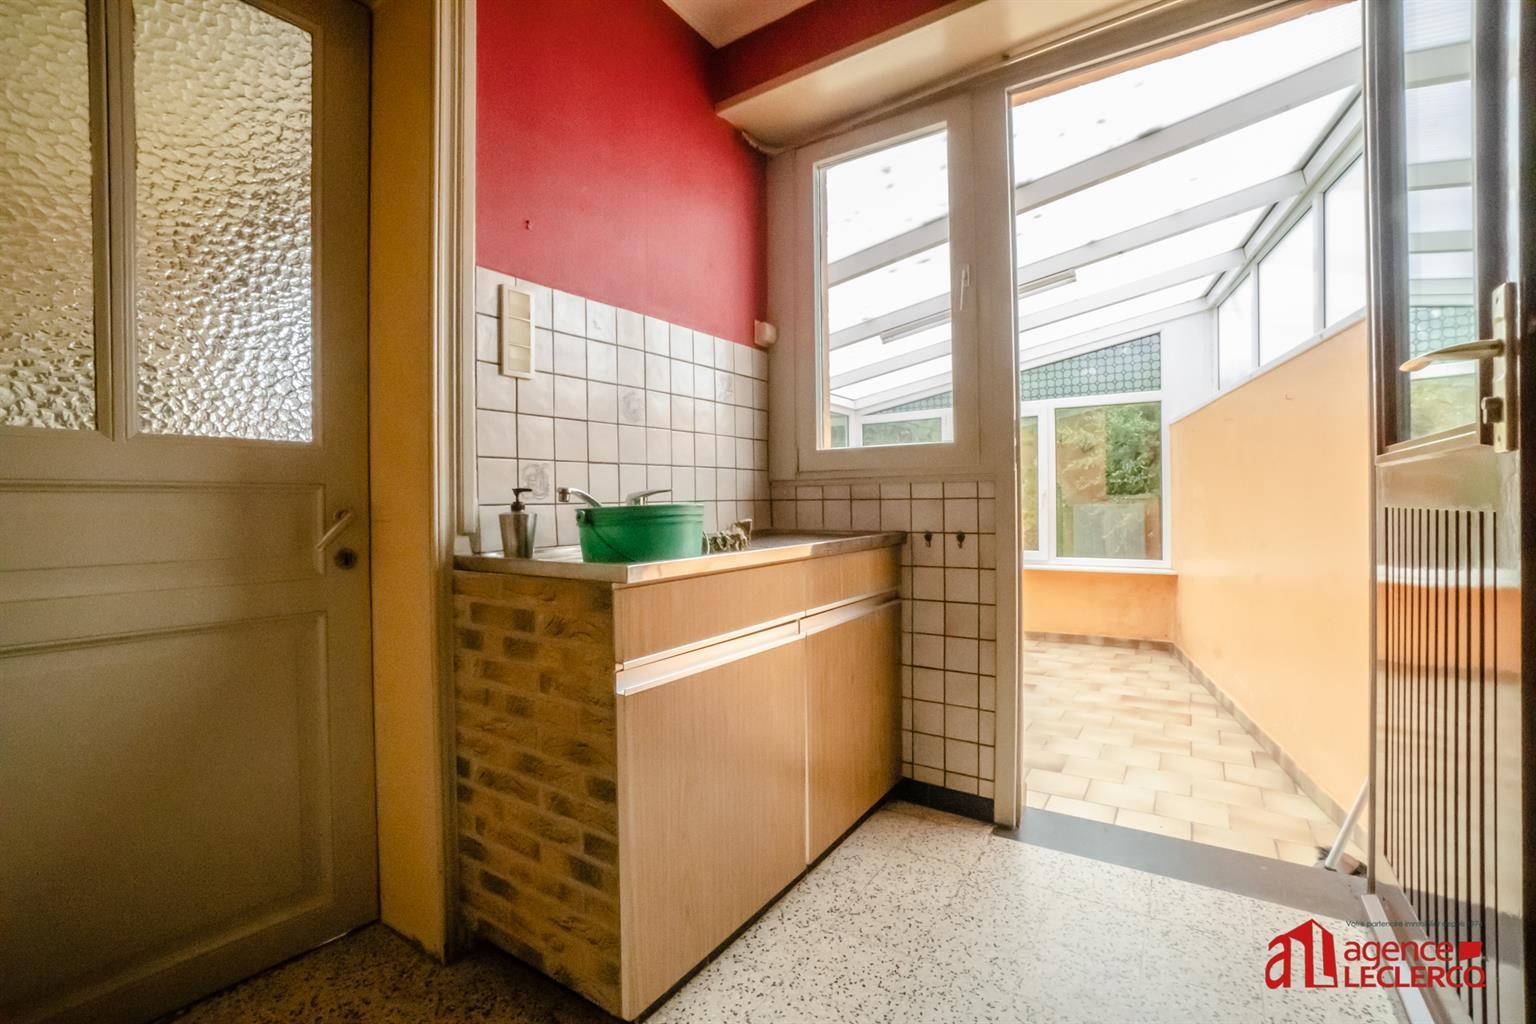 Maison - Bernissart Blaton - #4371908-24